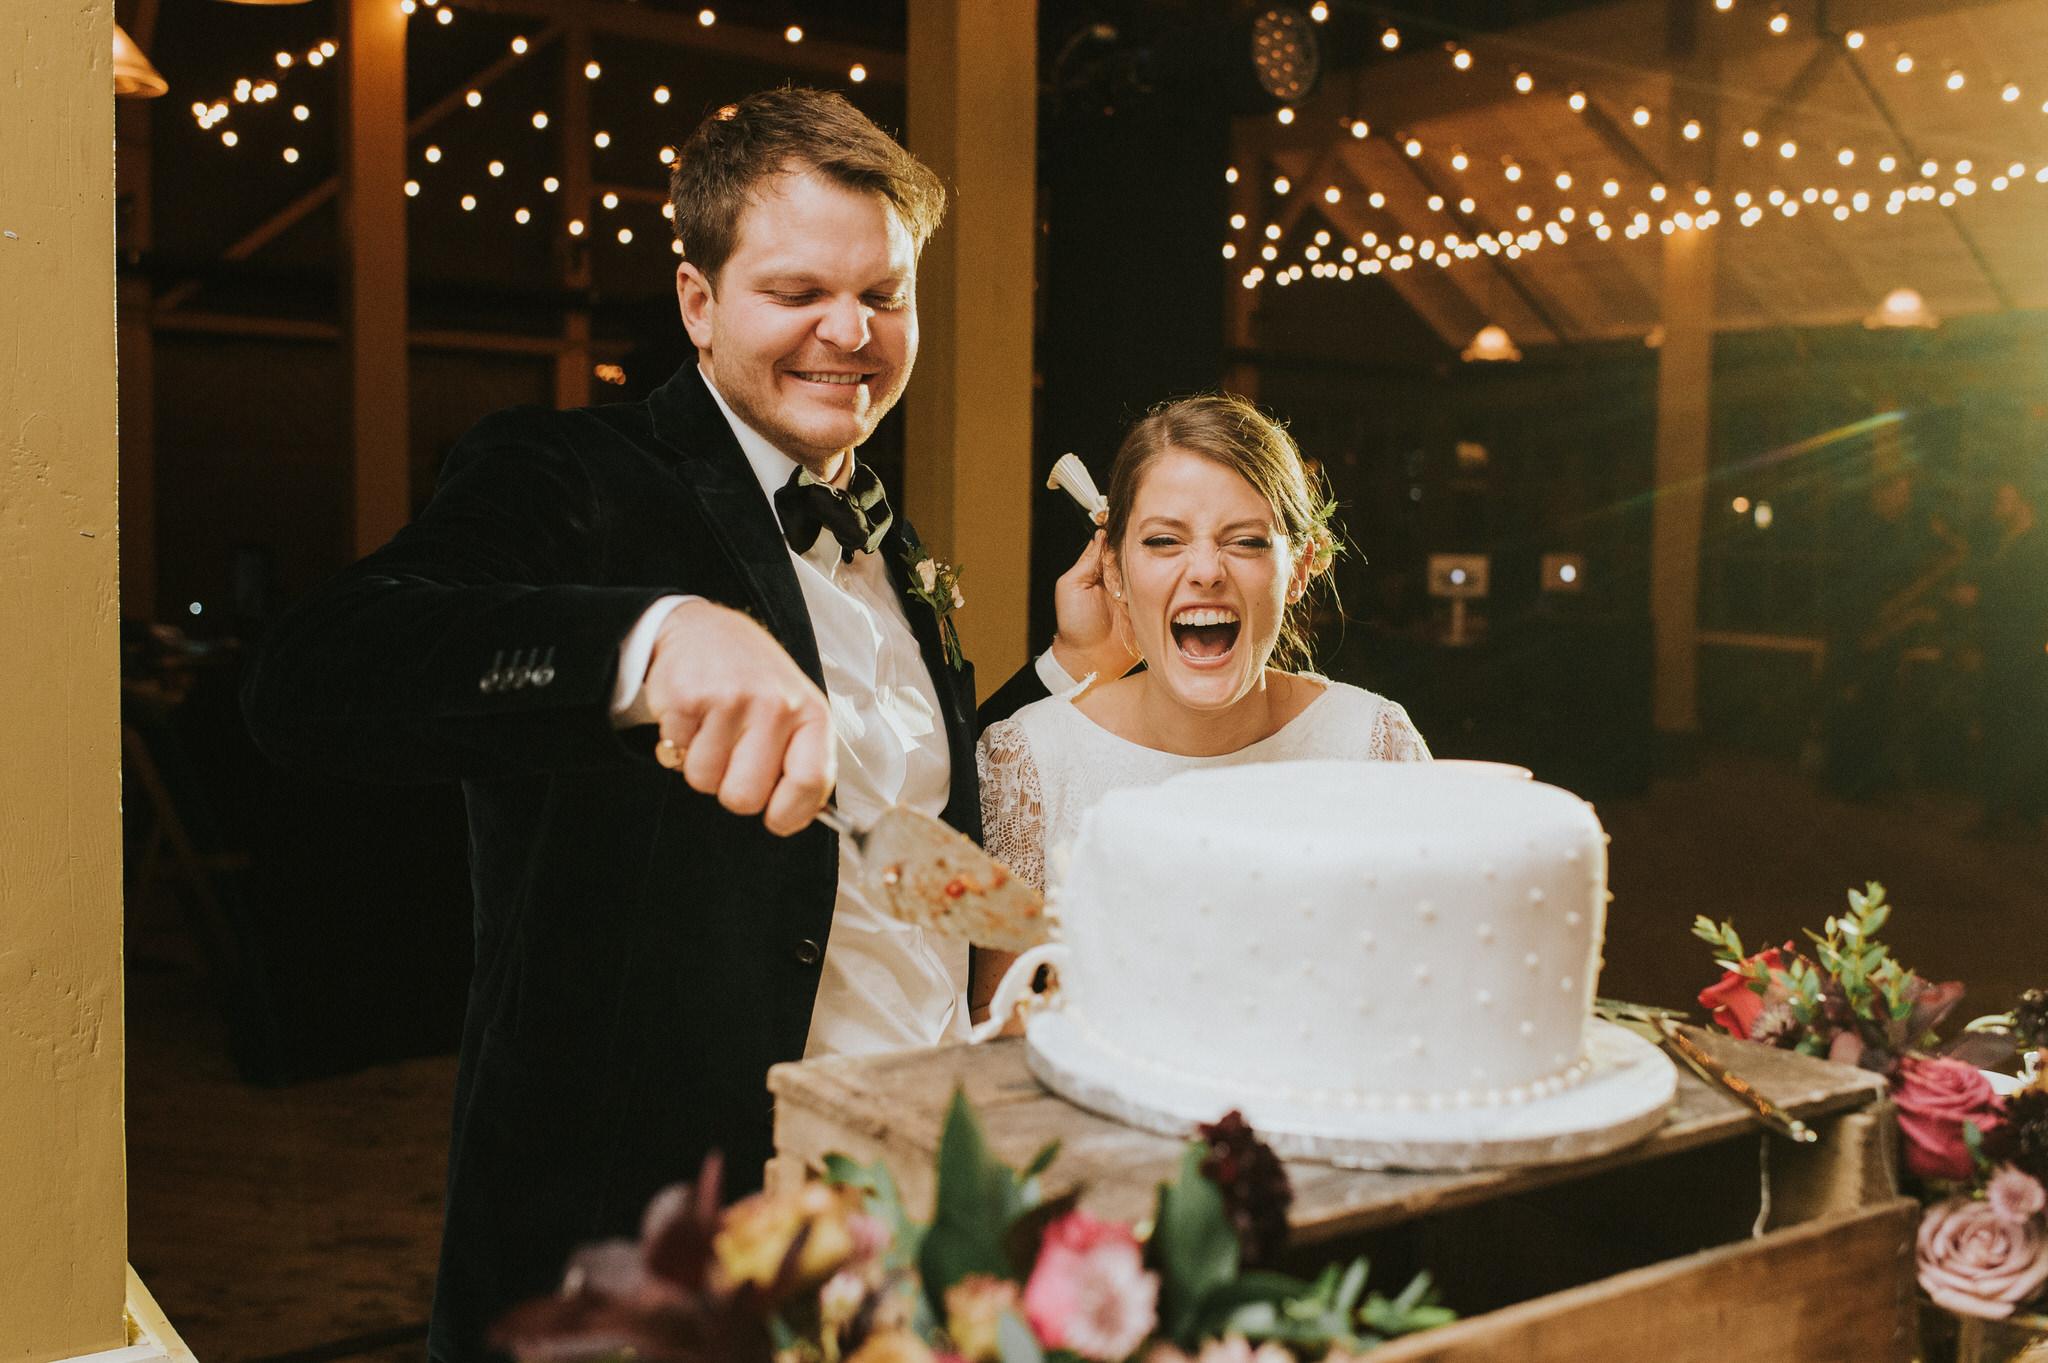 scarletoneillphotography_weddingphotography_prince edward county weddings166.JPG